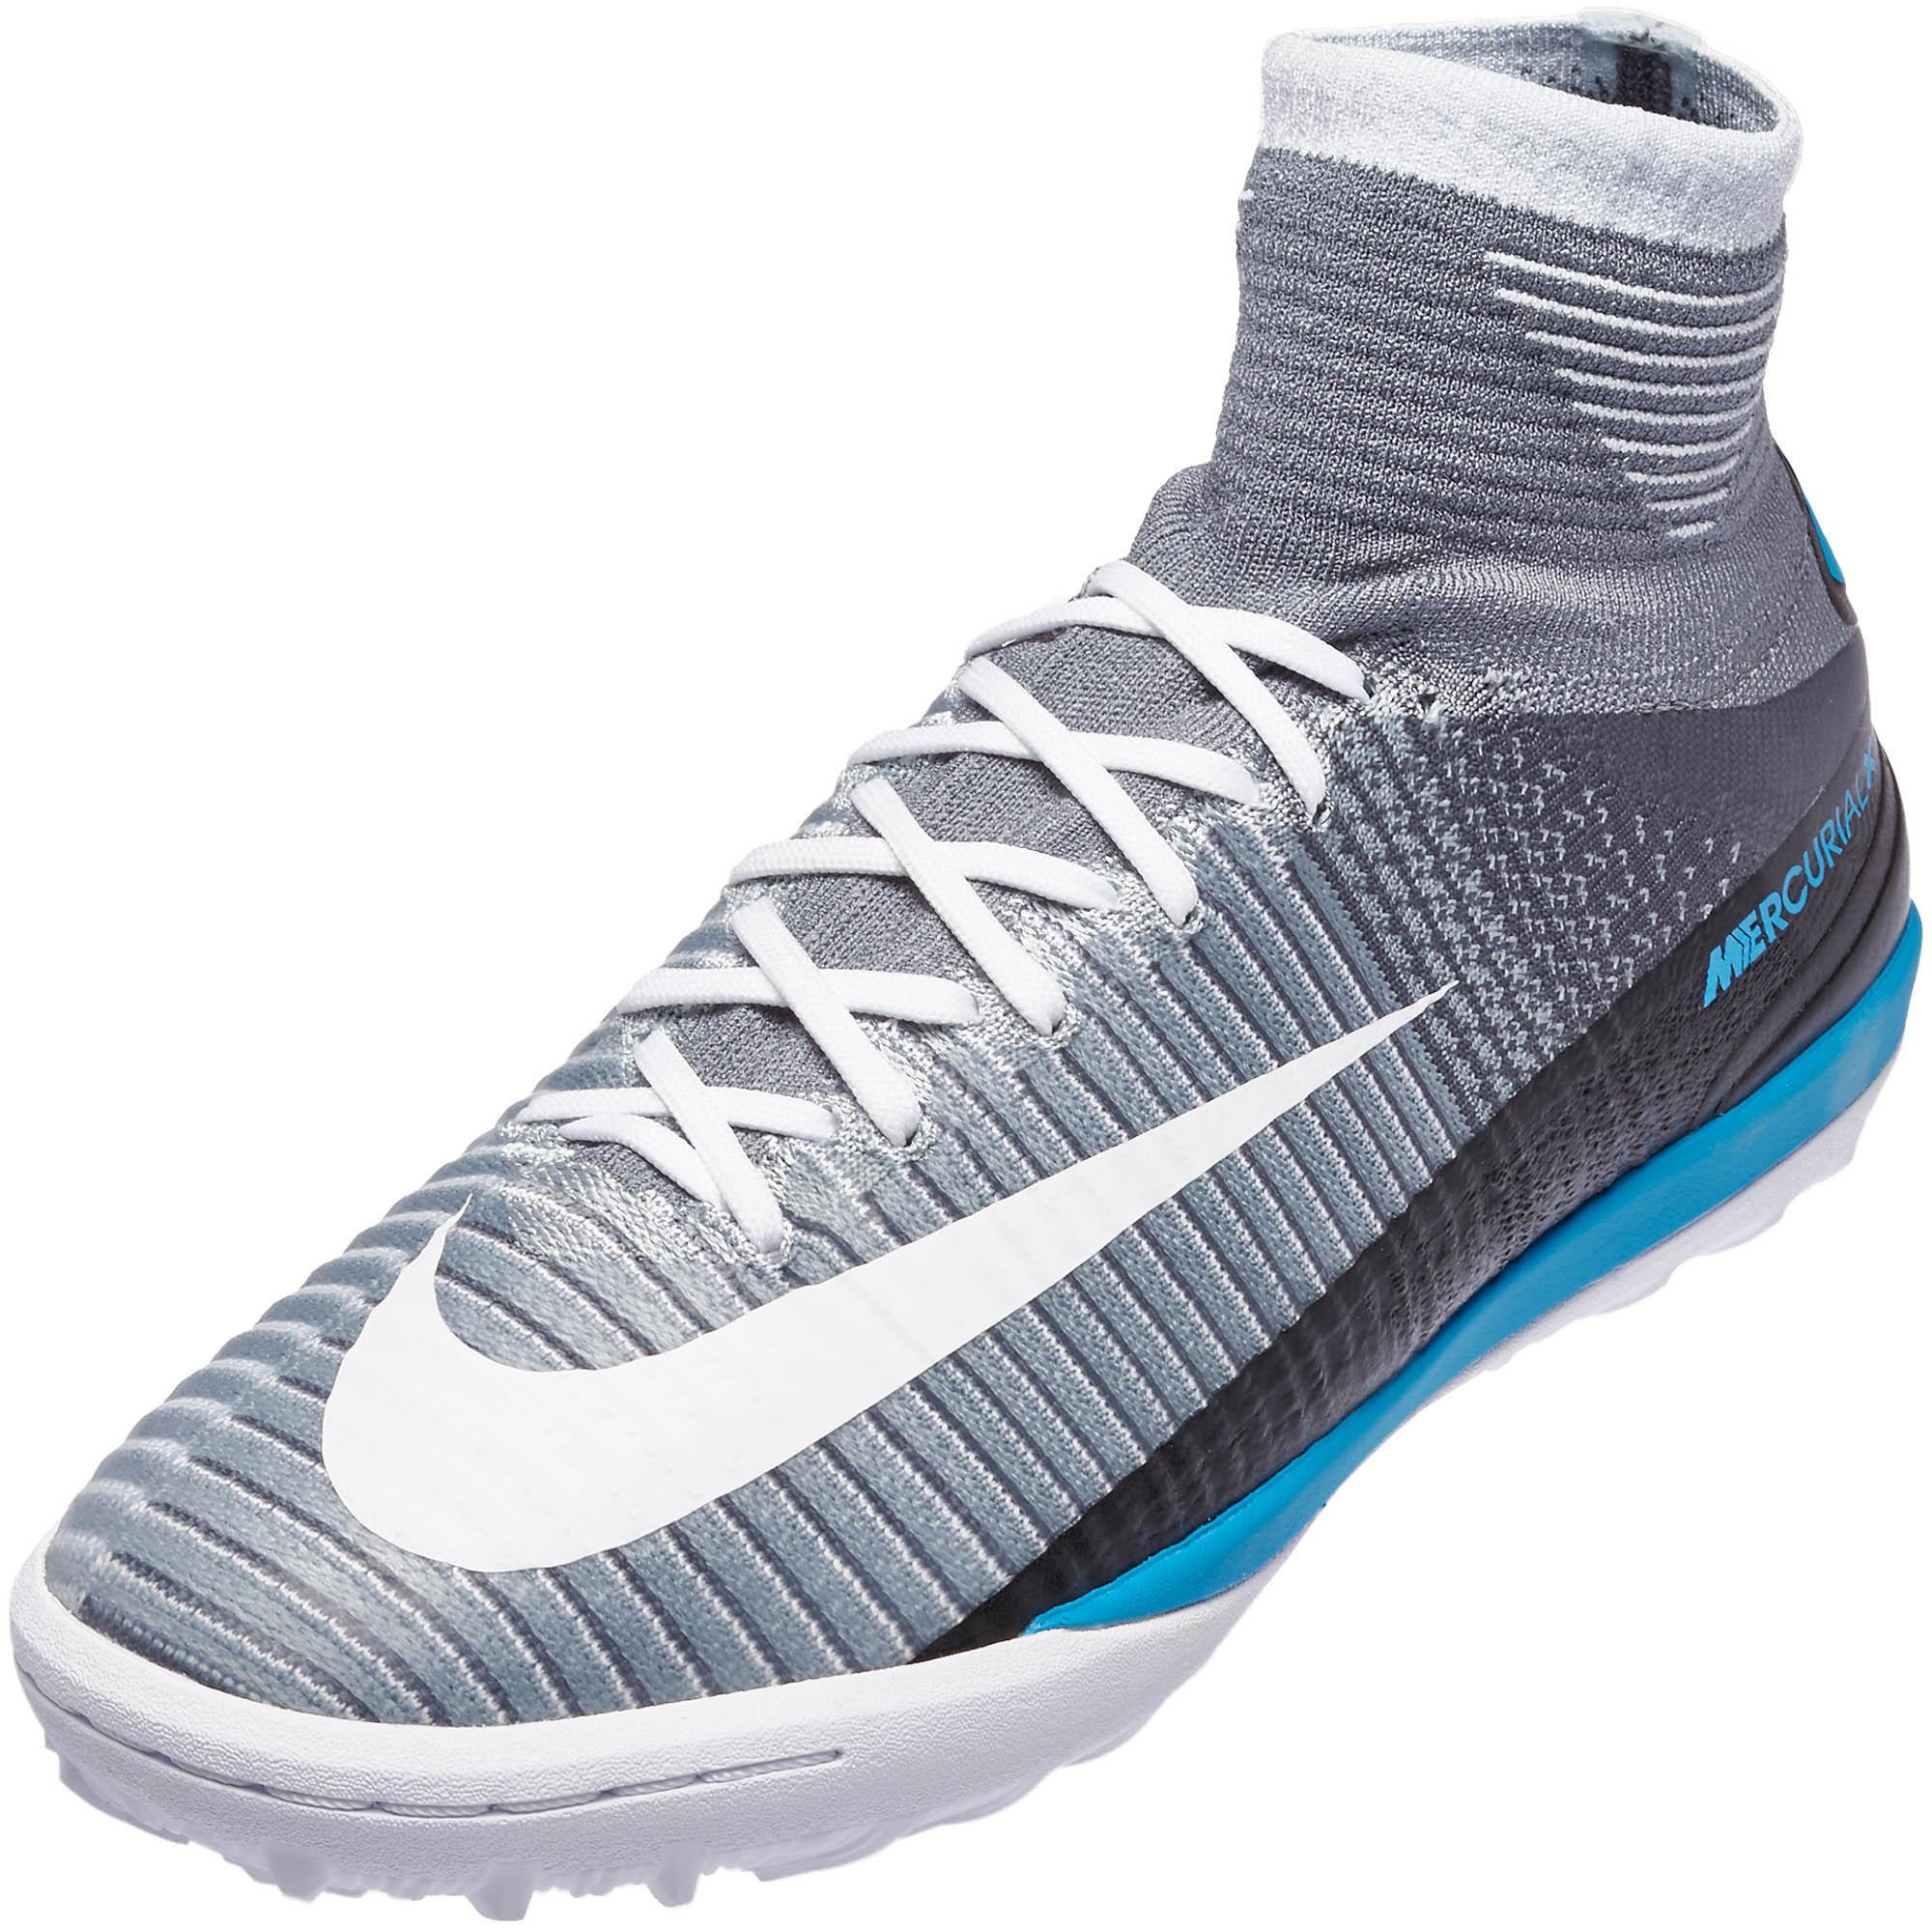 half off 9b8ad 68434 Nike MercurialX Proximo II TF – Wolf Grey Pure Platinum